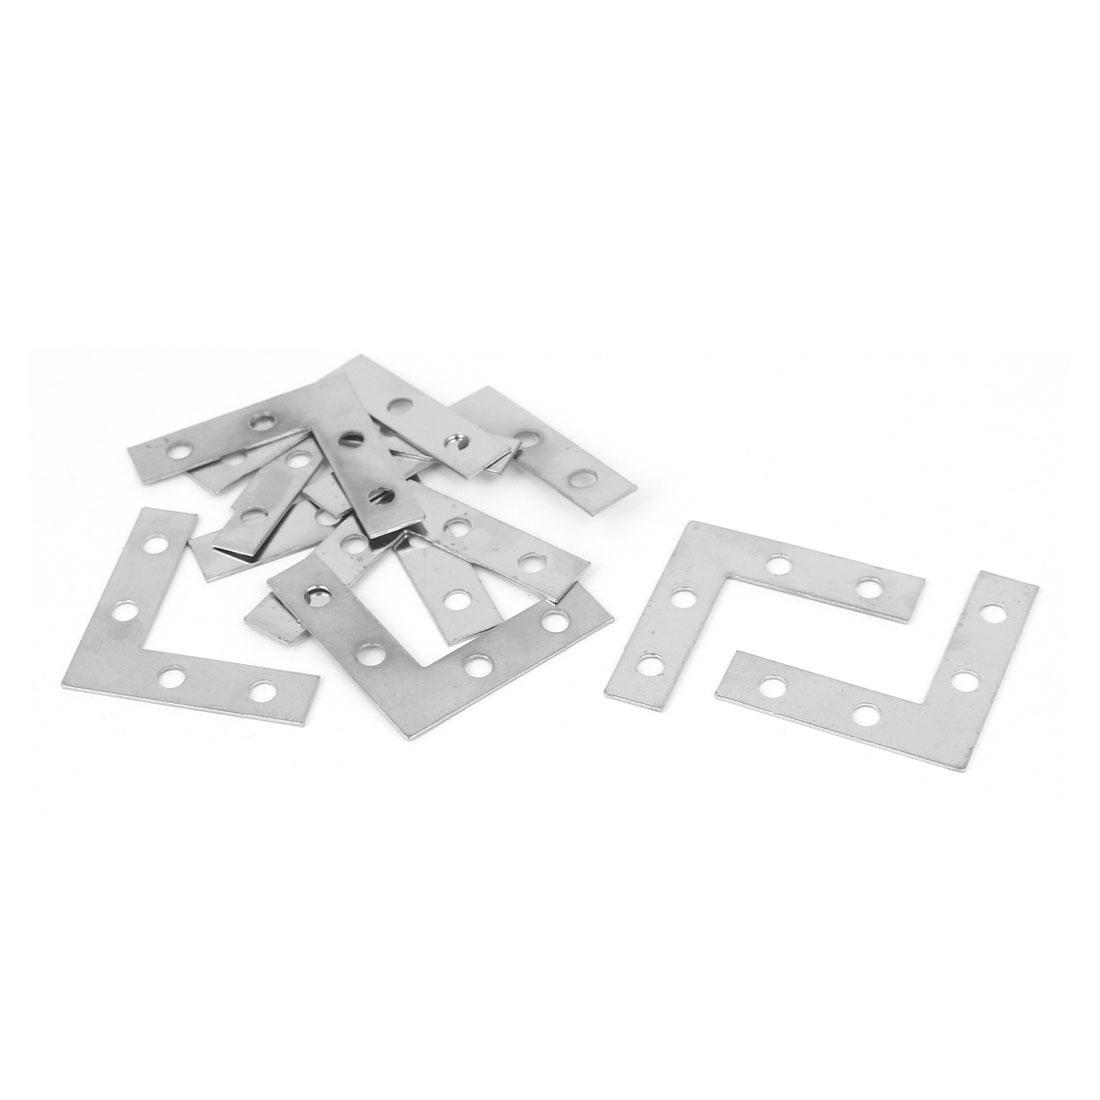 38mmx38mmx1mm L Shape Angle Bracket Corner Brace Mending Plate 10pcs